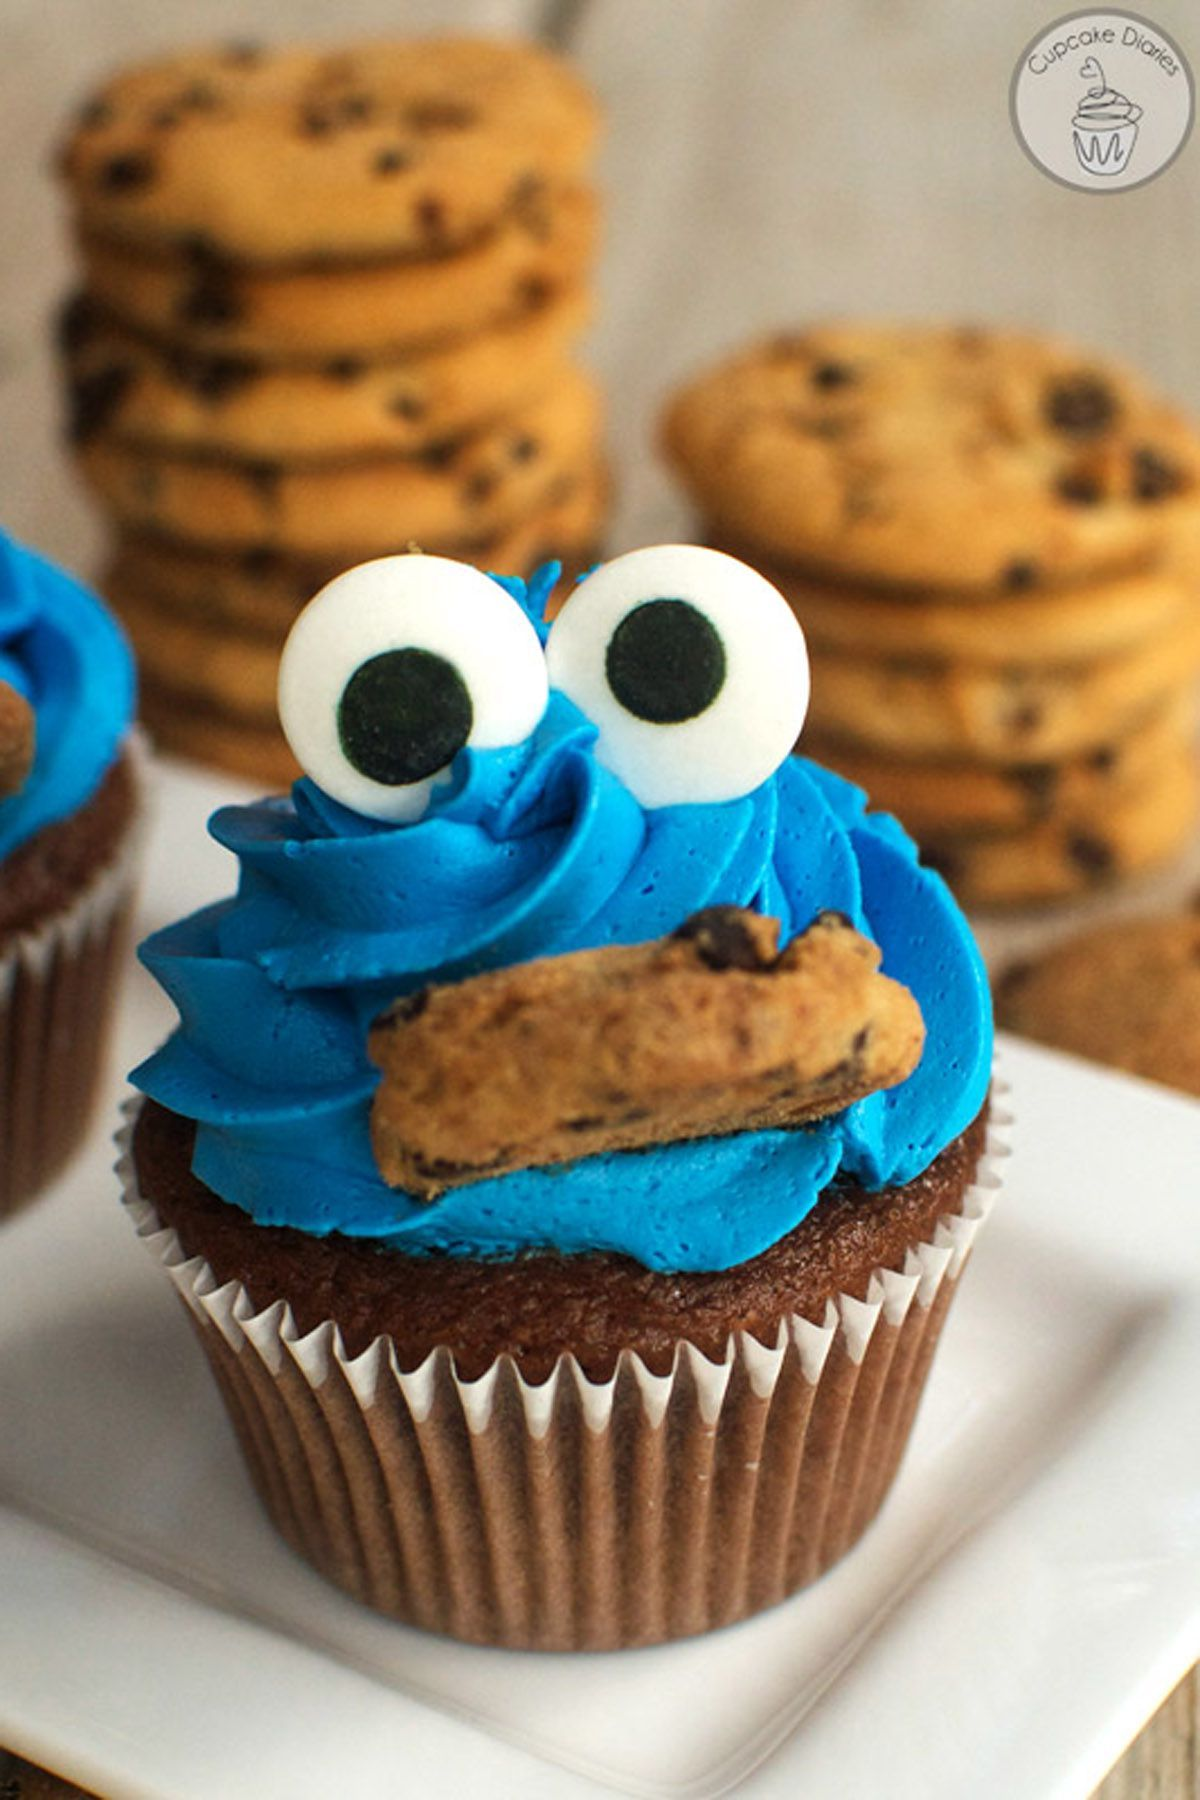 10 Crazy Cute Cupcake Recipes for Kids